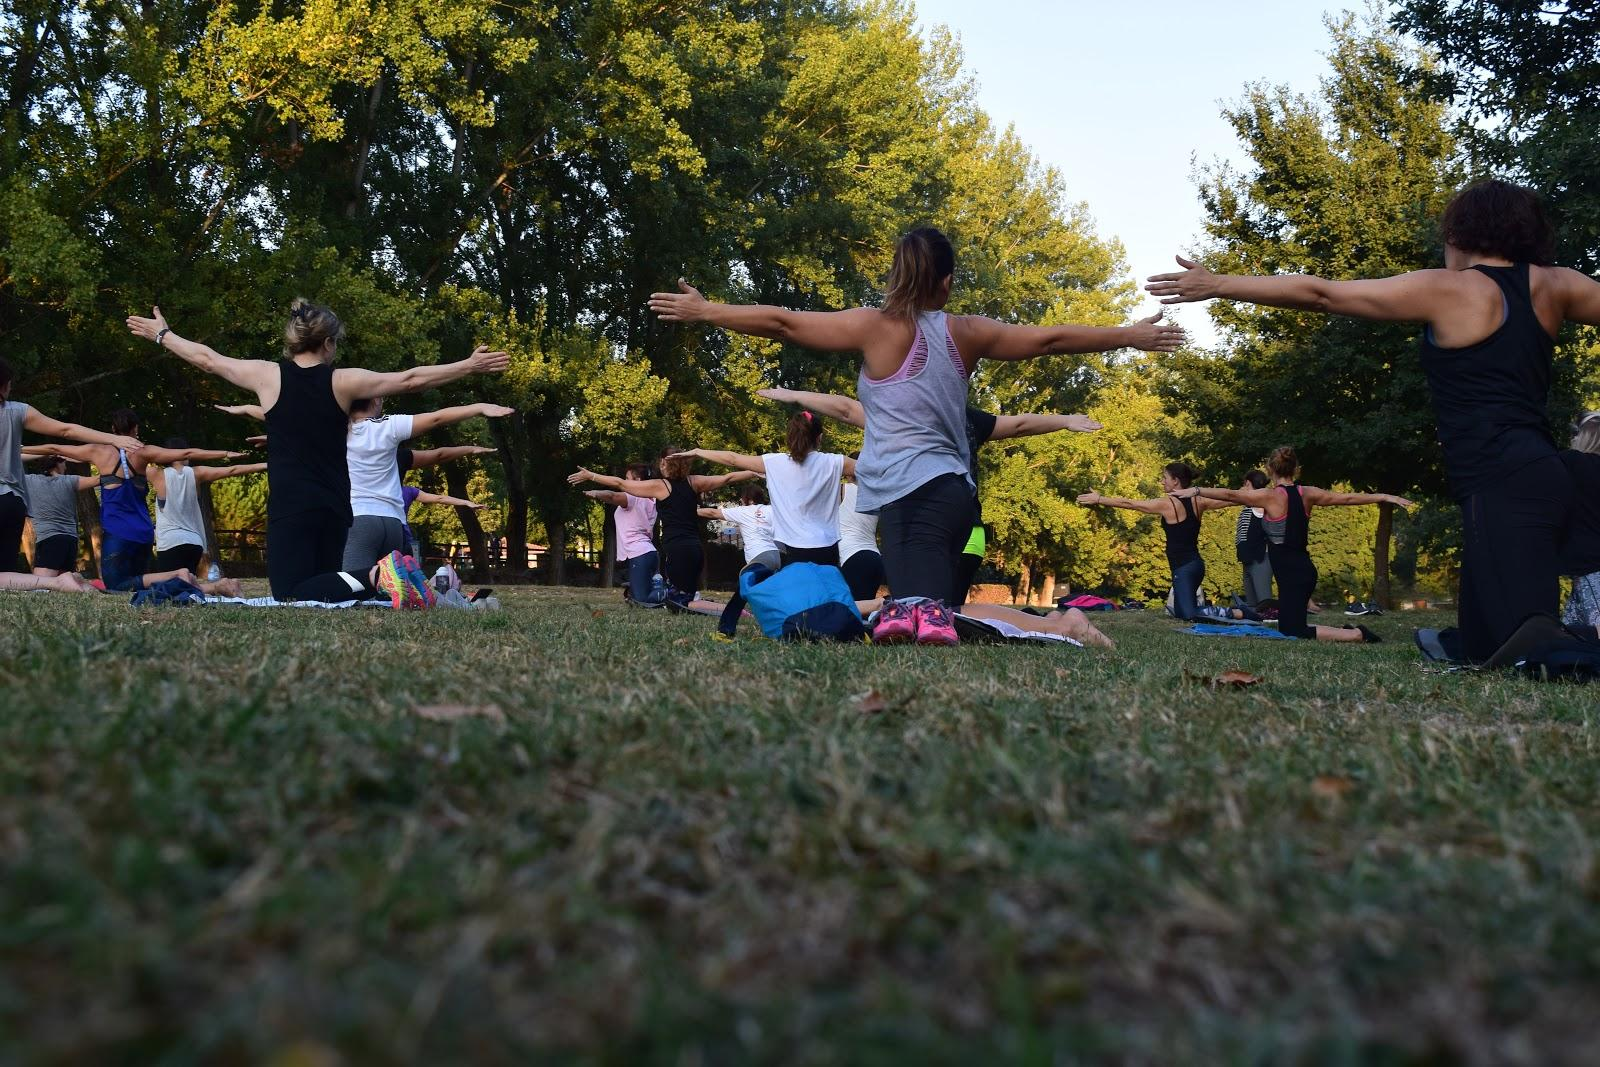 Practising yoga at park